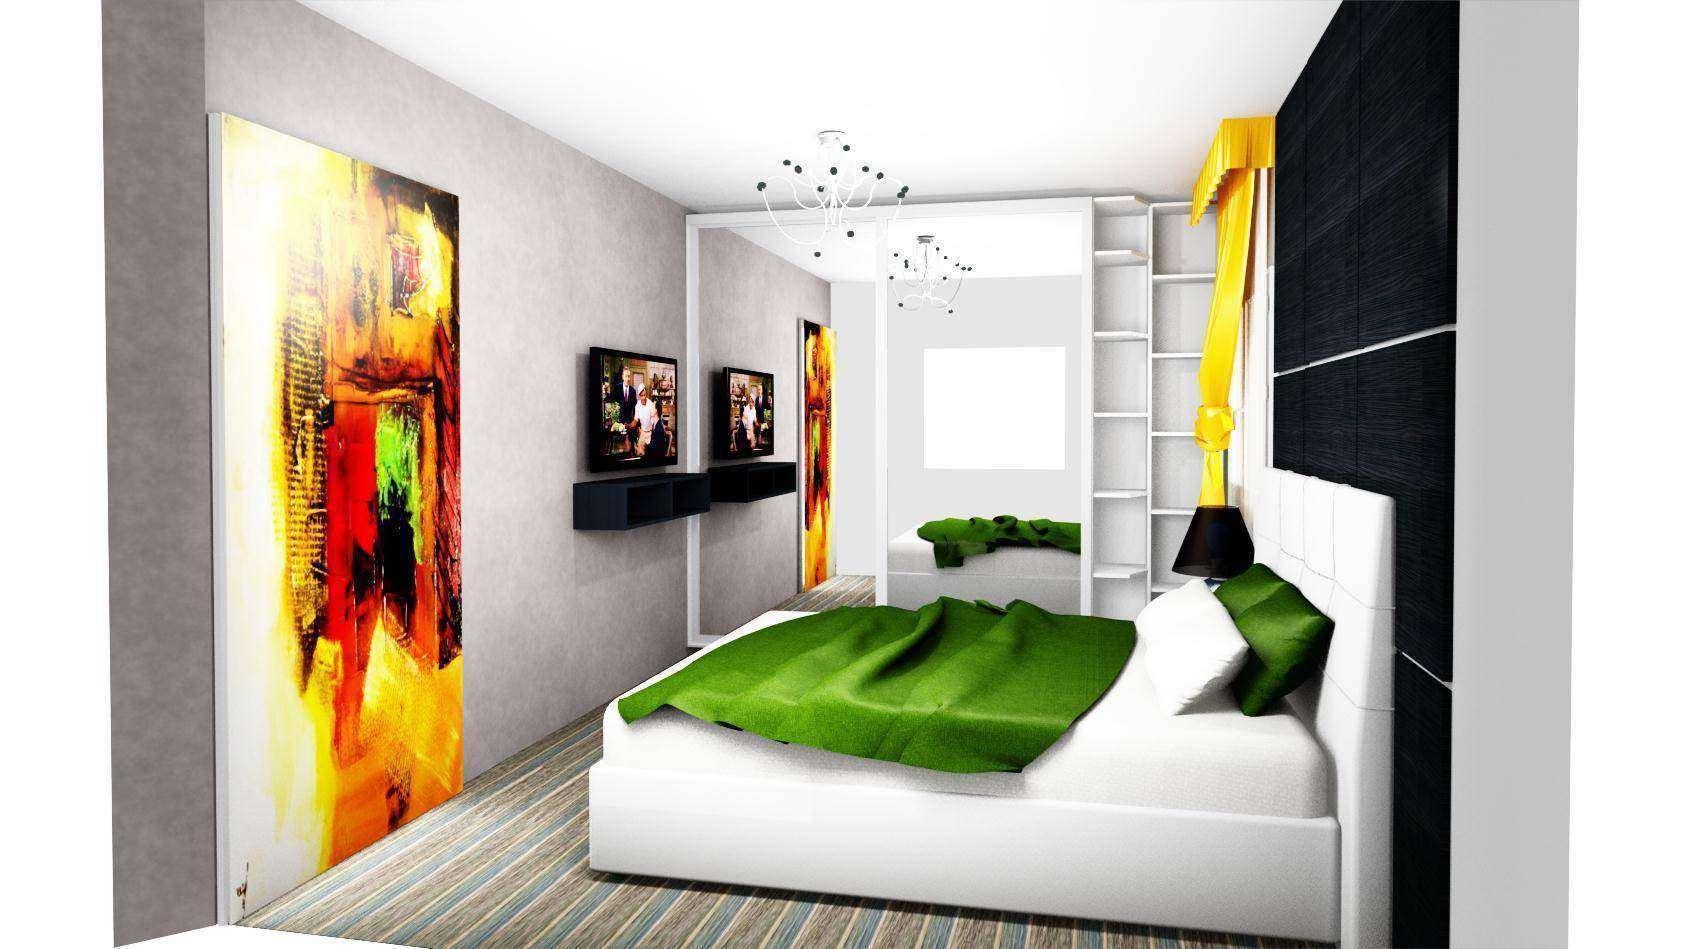 <a href=&quot;design interior dormitor&quot;>Dressing cu usi glisante de oglinda si pat tapitat<img src='http://www.unican.ro/wp-content/themes/vita/img/dreapta.png' class='pull-right hidden-xs' style='margin-right:-10px;margin-top:-10px; max-height:41px'></a>